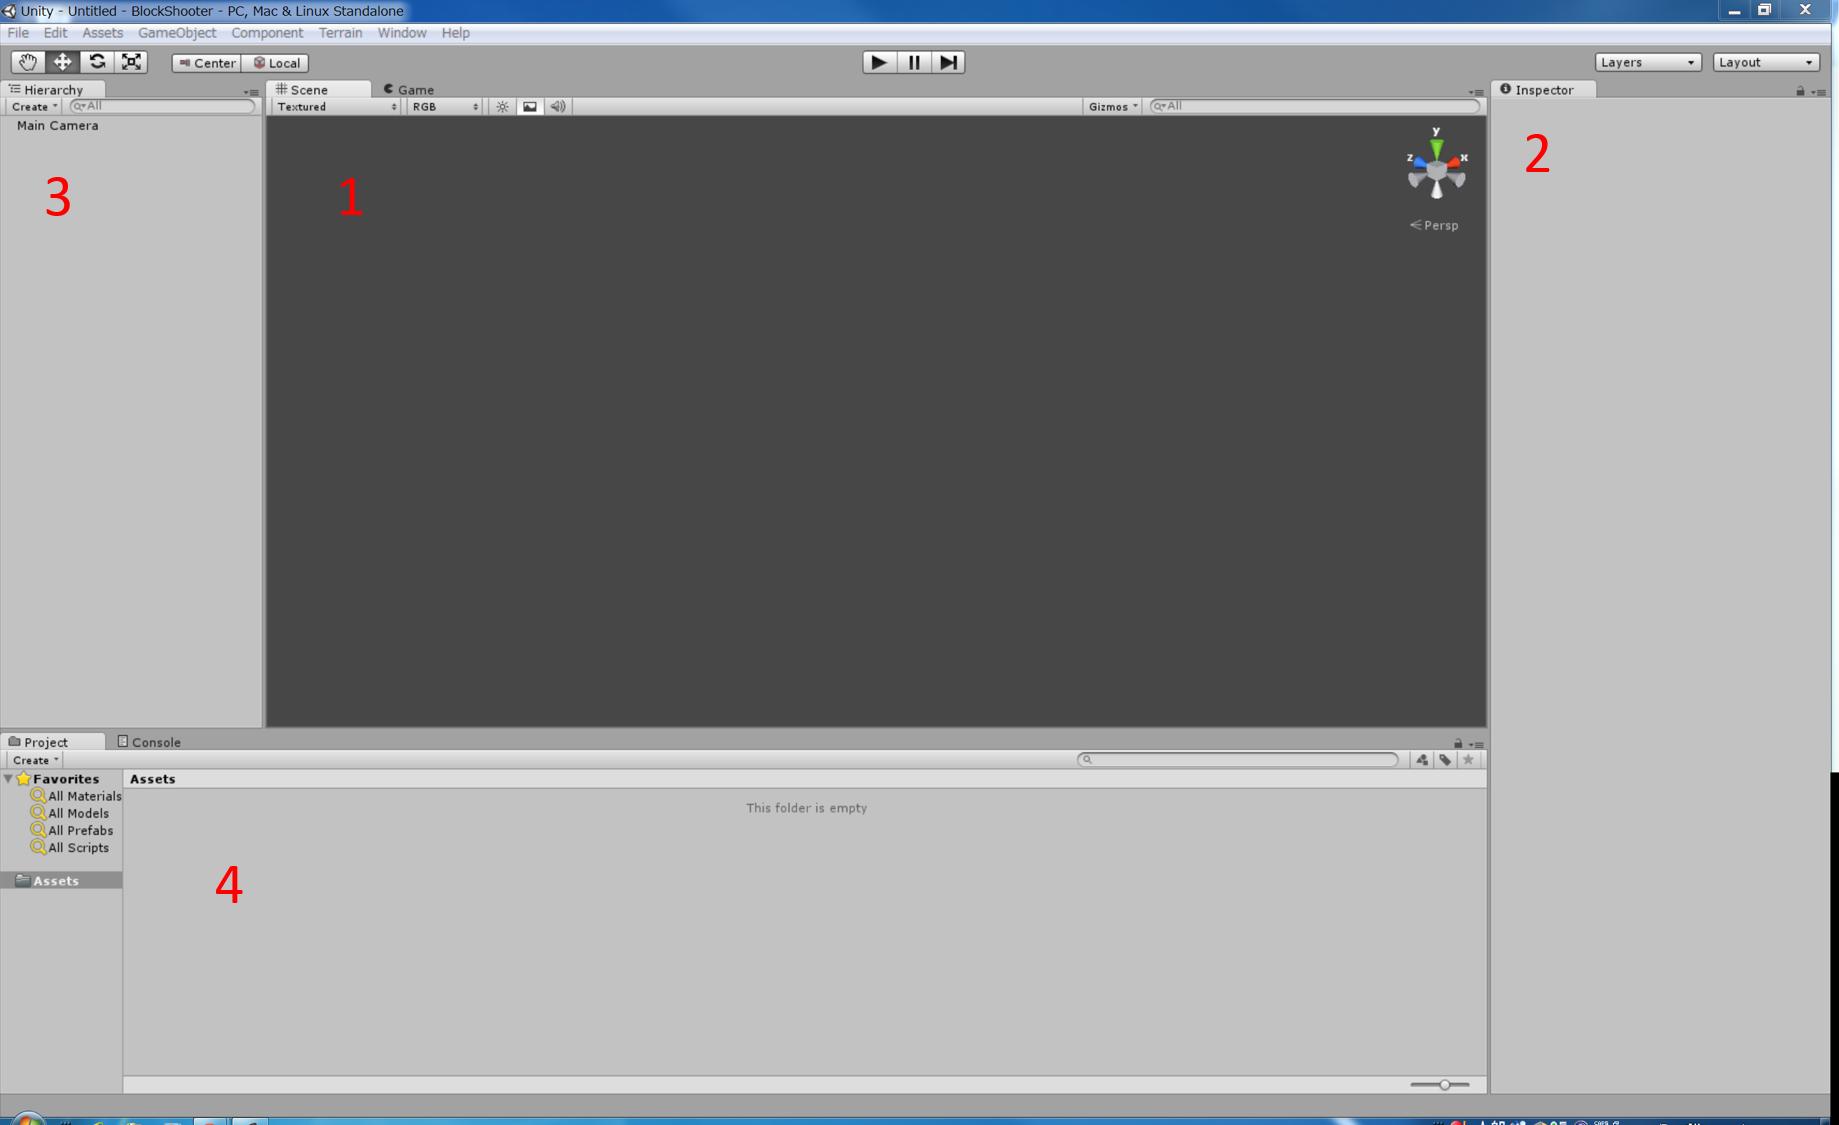 Unityの画面